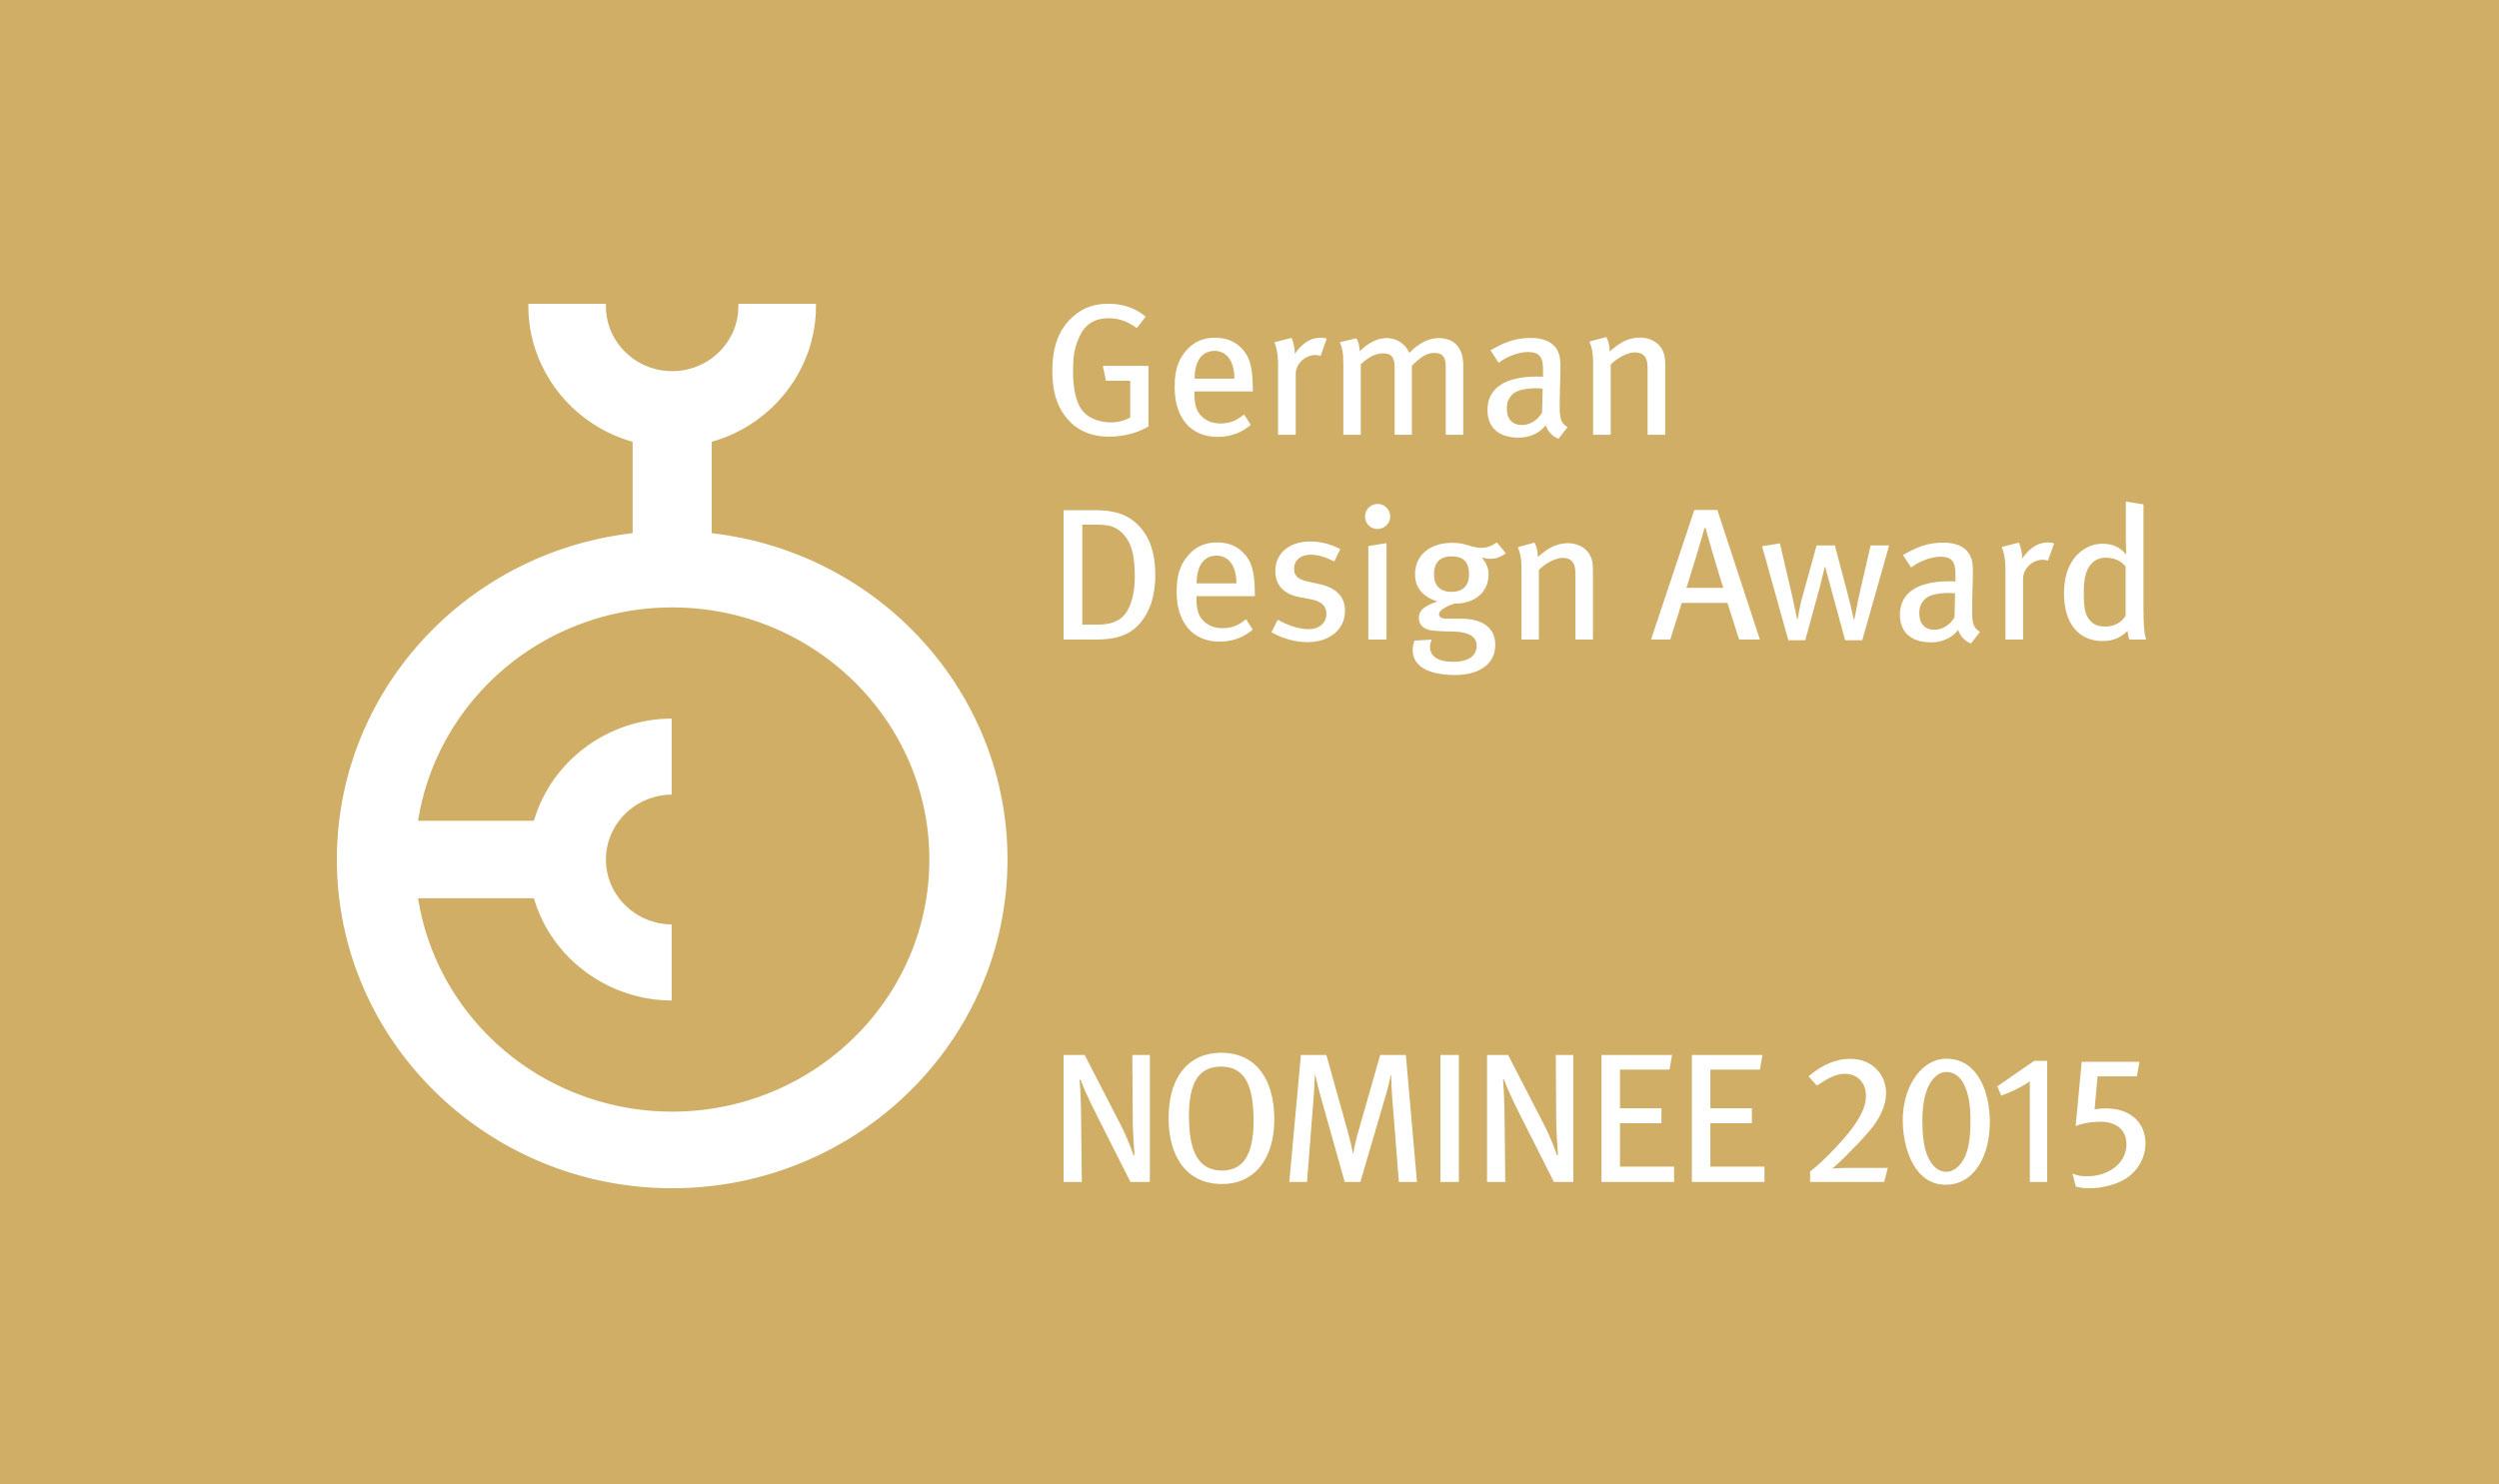 AWARD_German-Design-Award_2015_Nominee